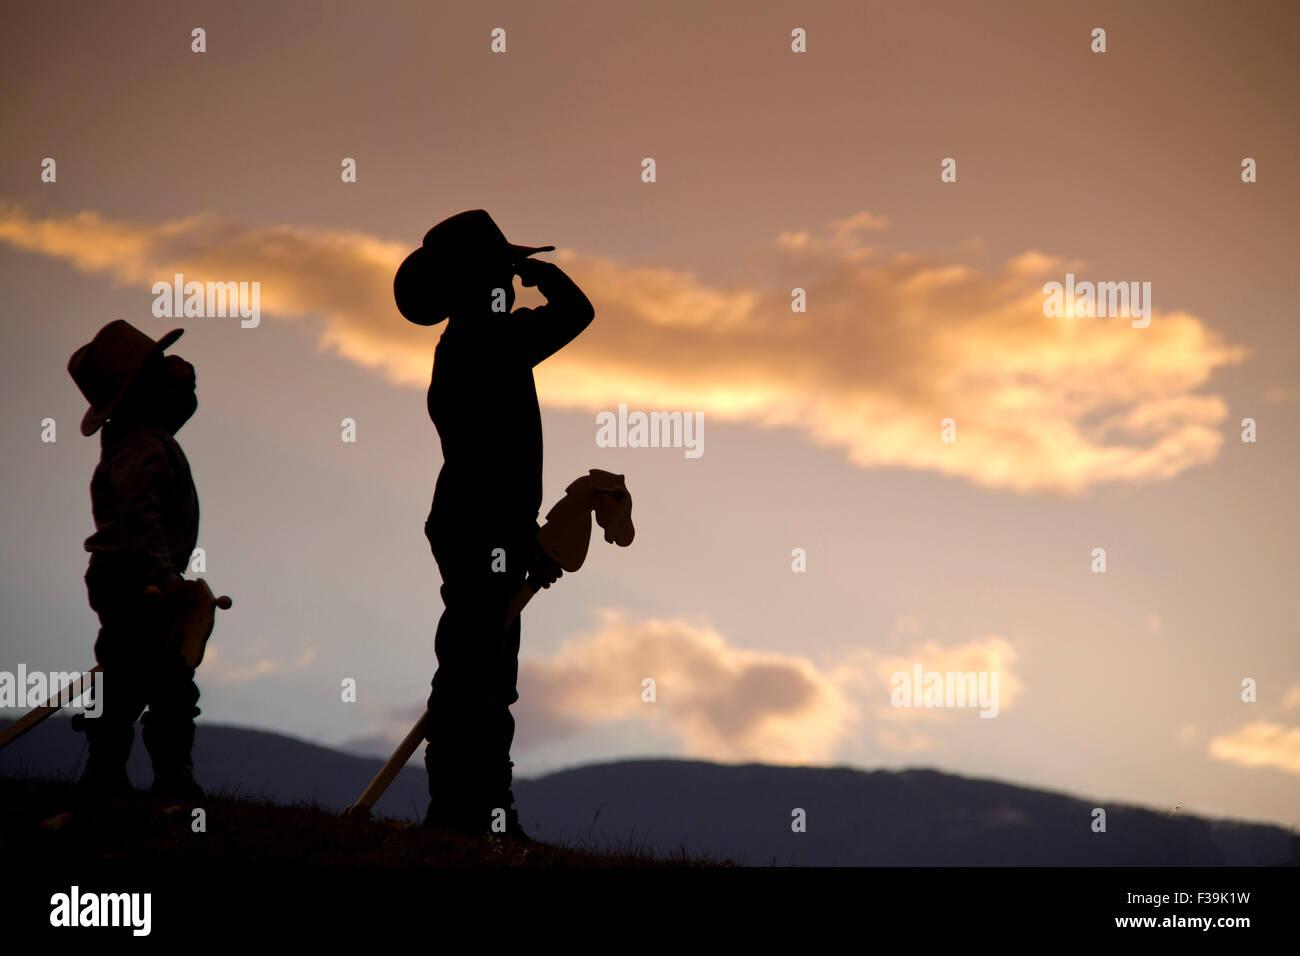 Silueta de dos muchachos con hobby caballos fingiendo ser cowboys saludando con orgullo Foto de stock